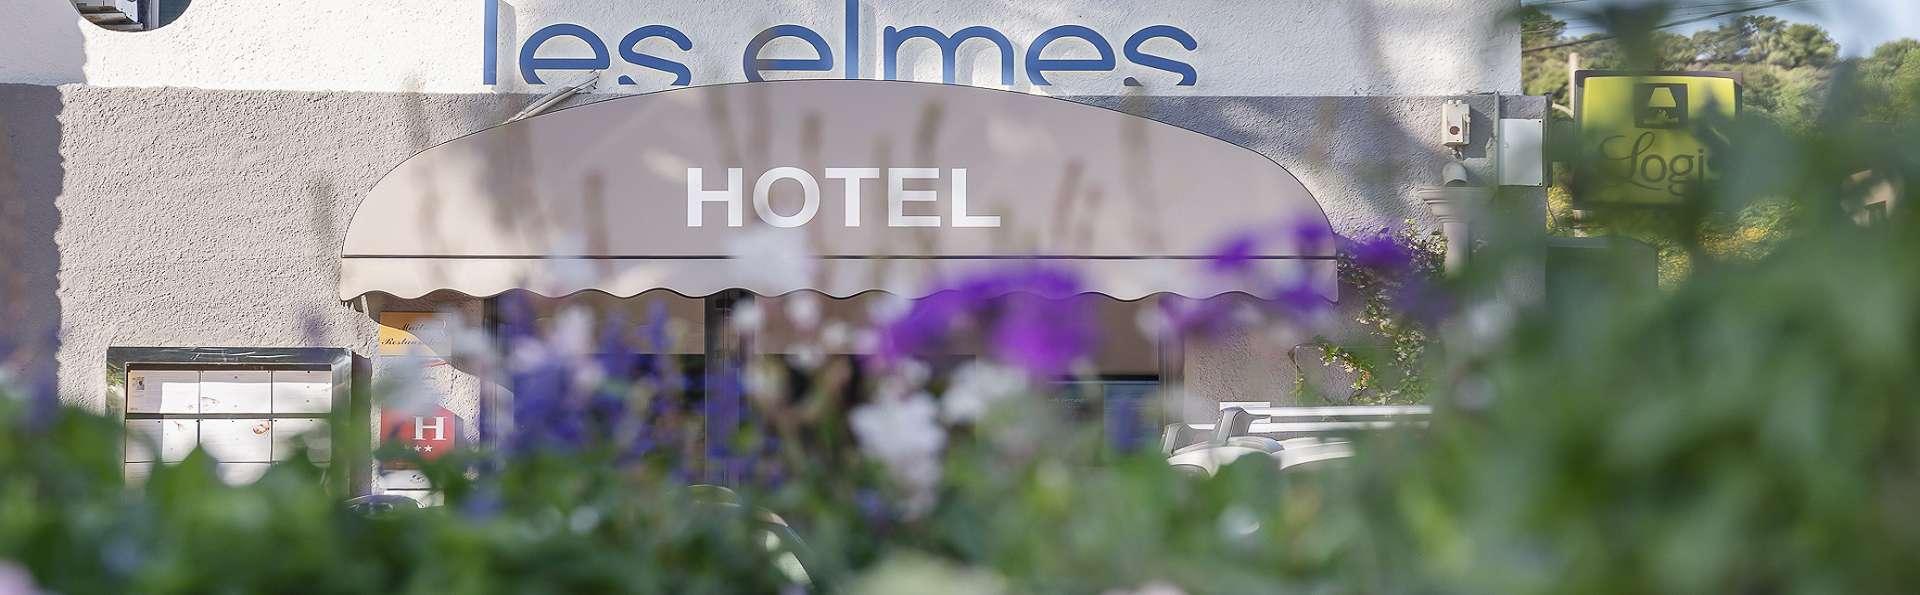 Hôtel des Elmes - _DSC1194.jpg